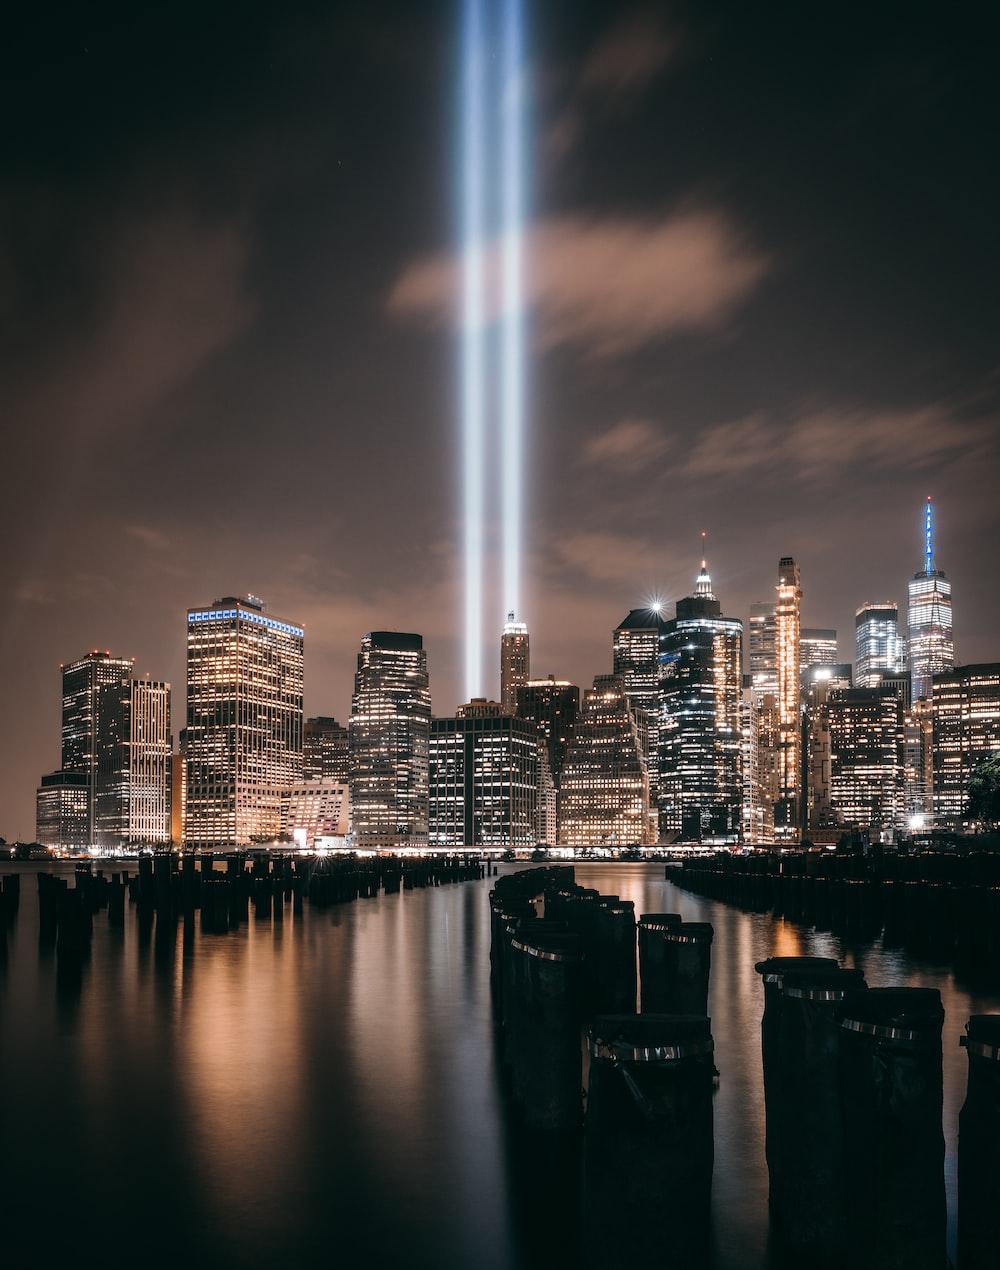 the 9/11 memorial lights over the New York City skyline